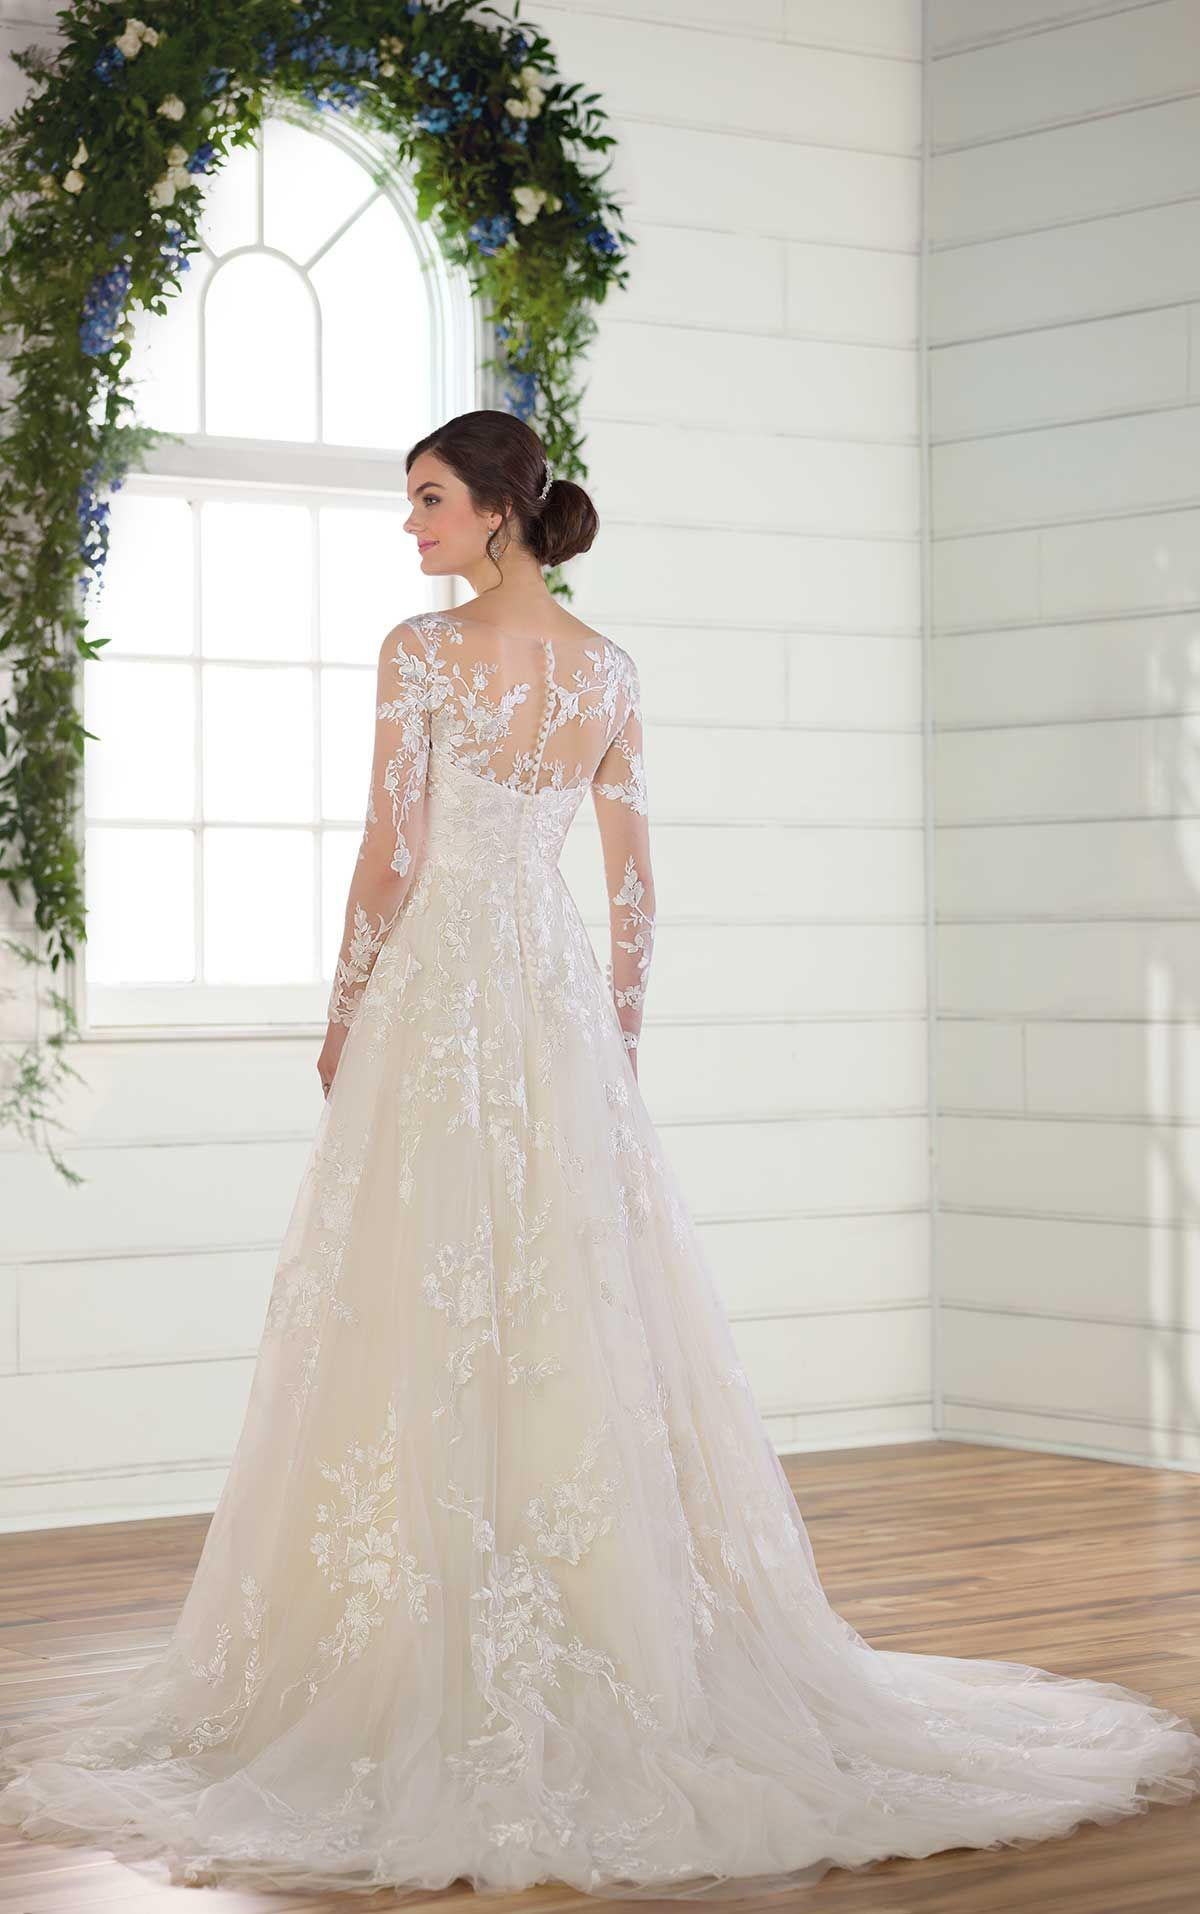 My dress modest wedding dress with sleeves essense of australia